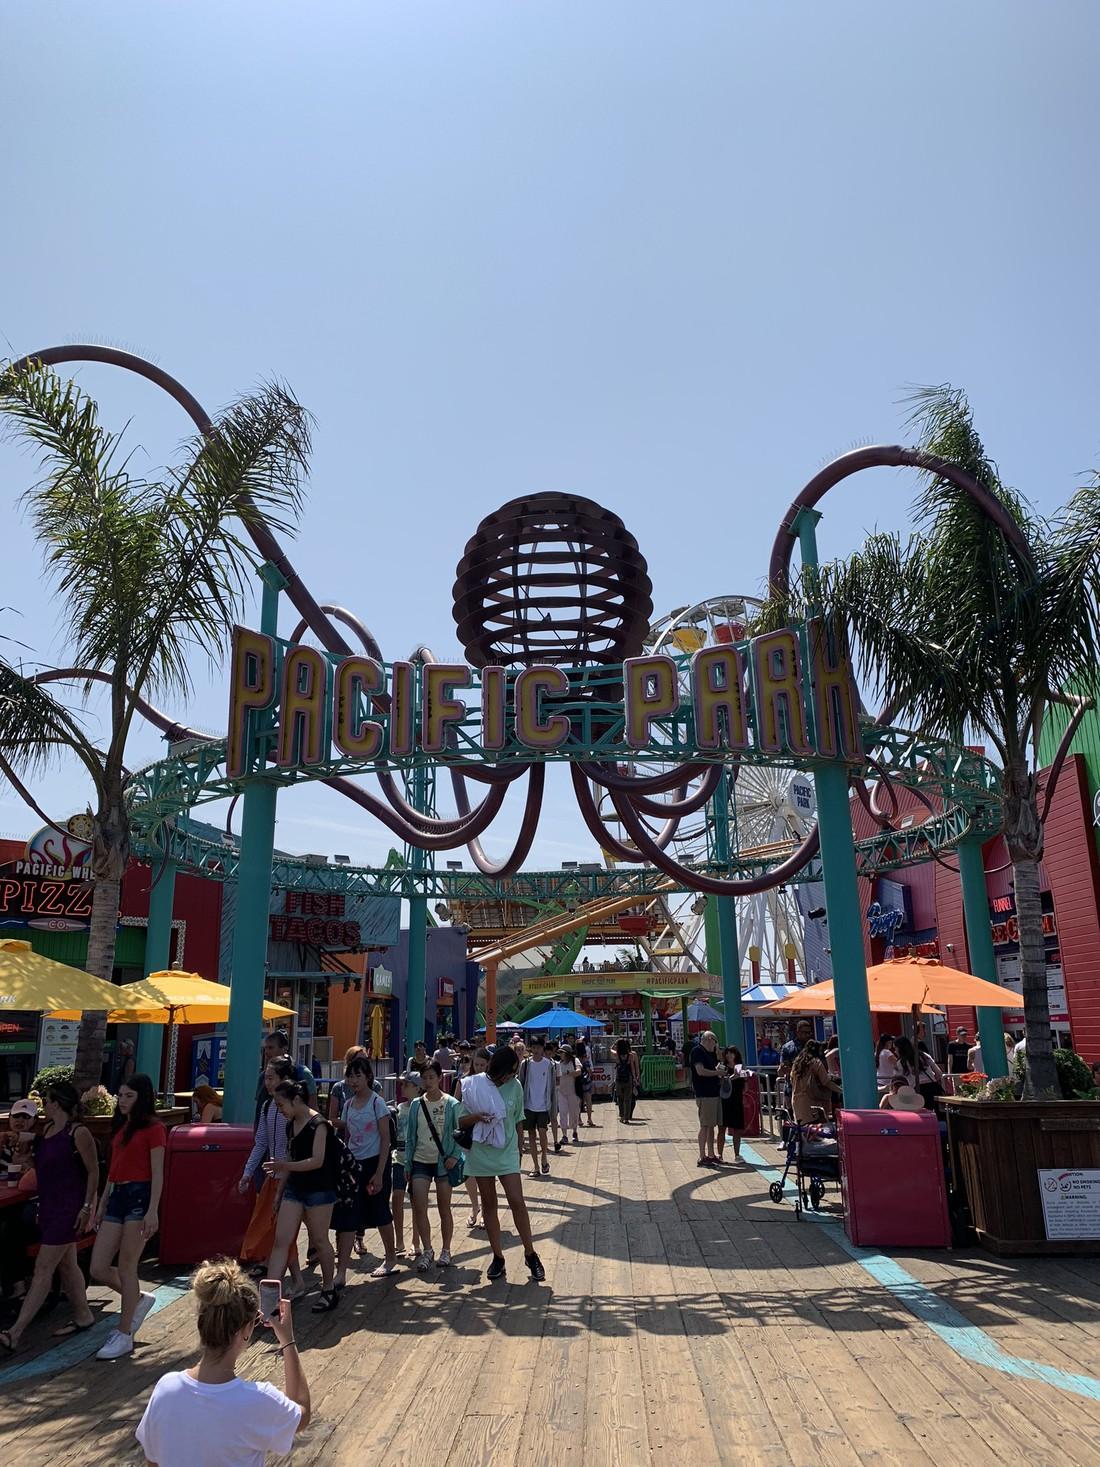 Santa Monica - Los Angeles - California - Amerika - Doets Reizen